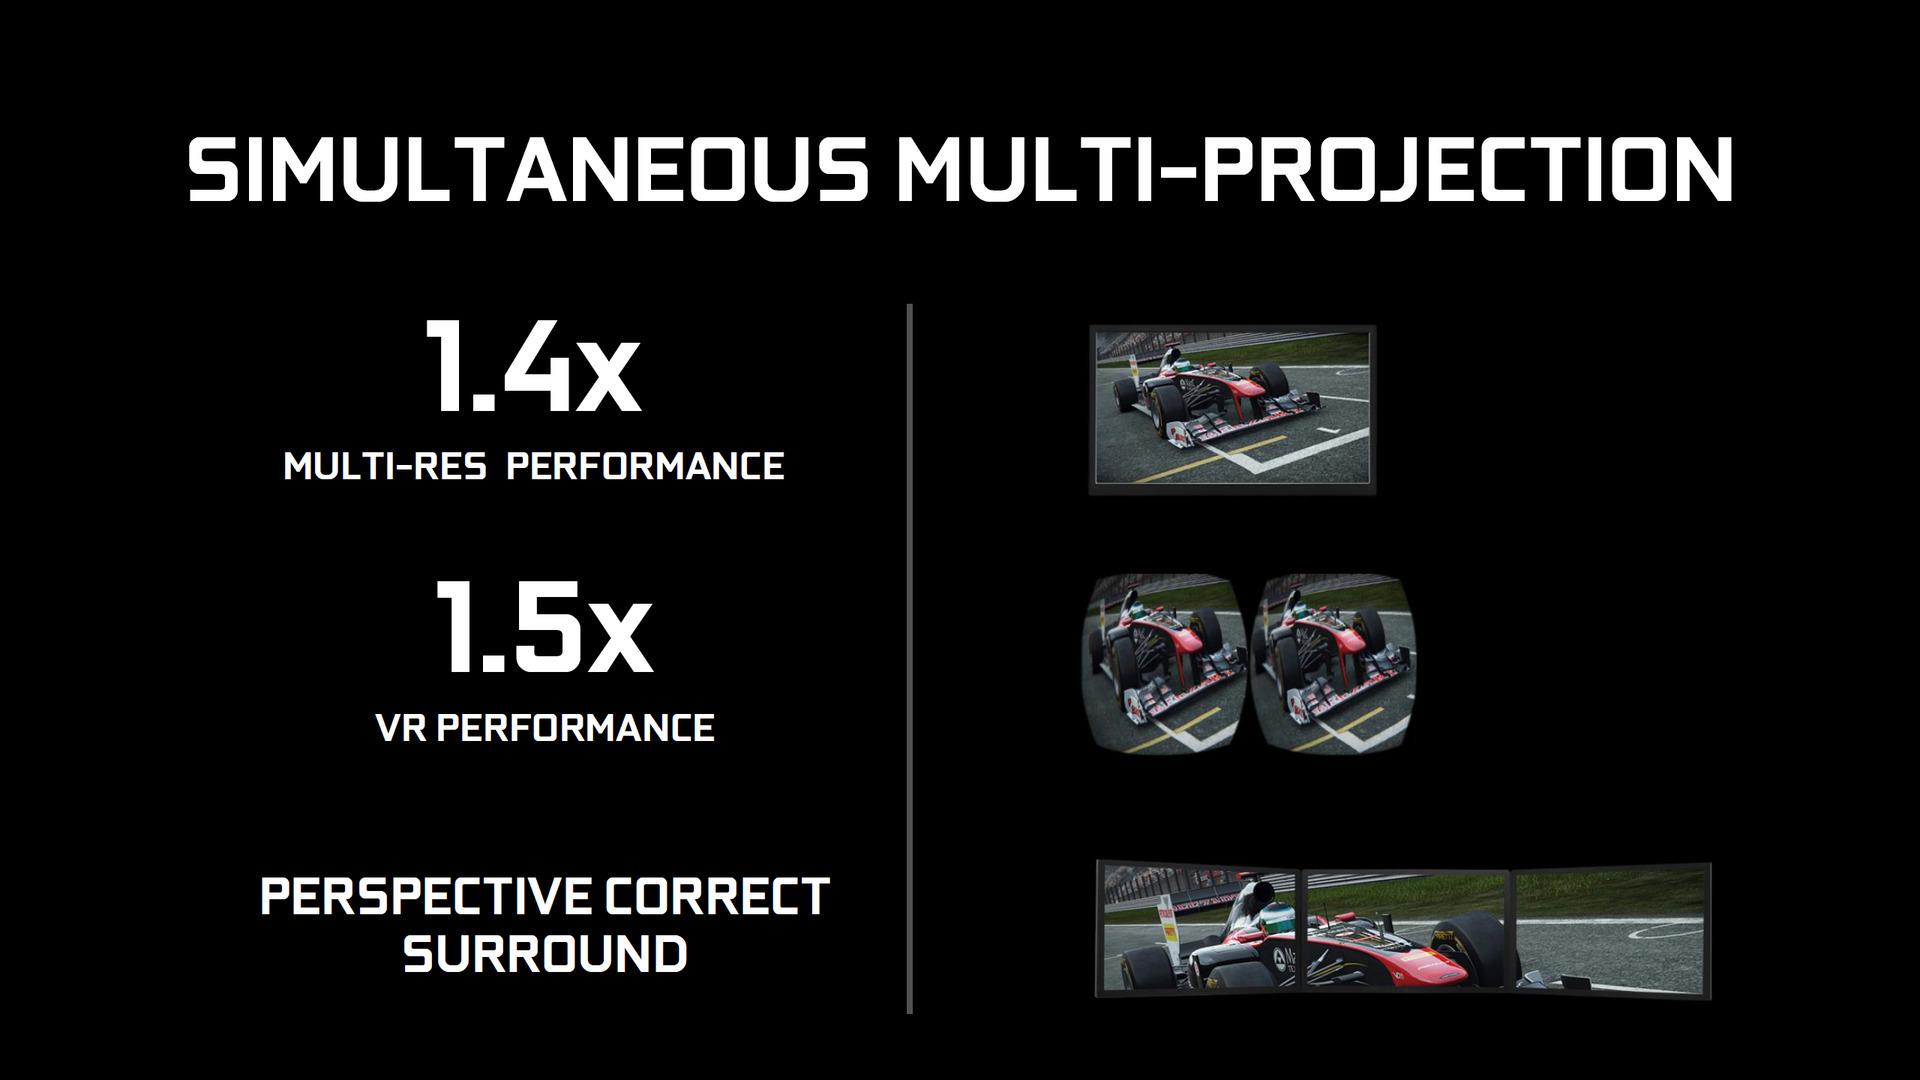 「Simultaneous Multi-Projection(SMP)」機能でさらにVRが1.5倍速!と主張